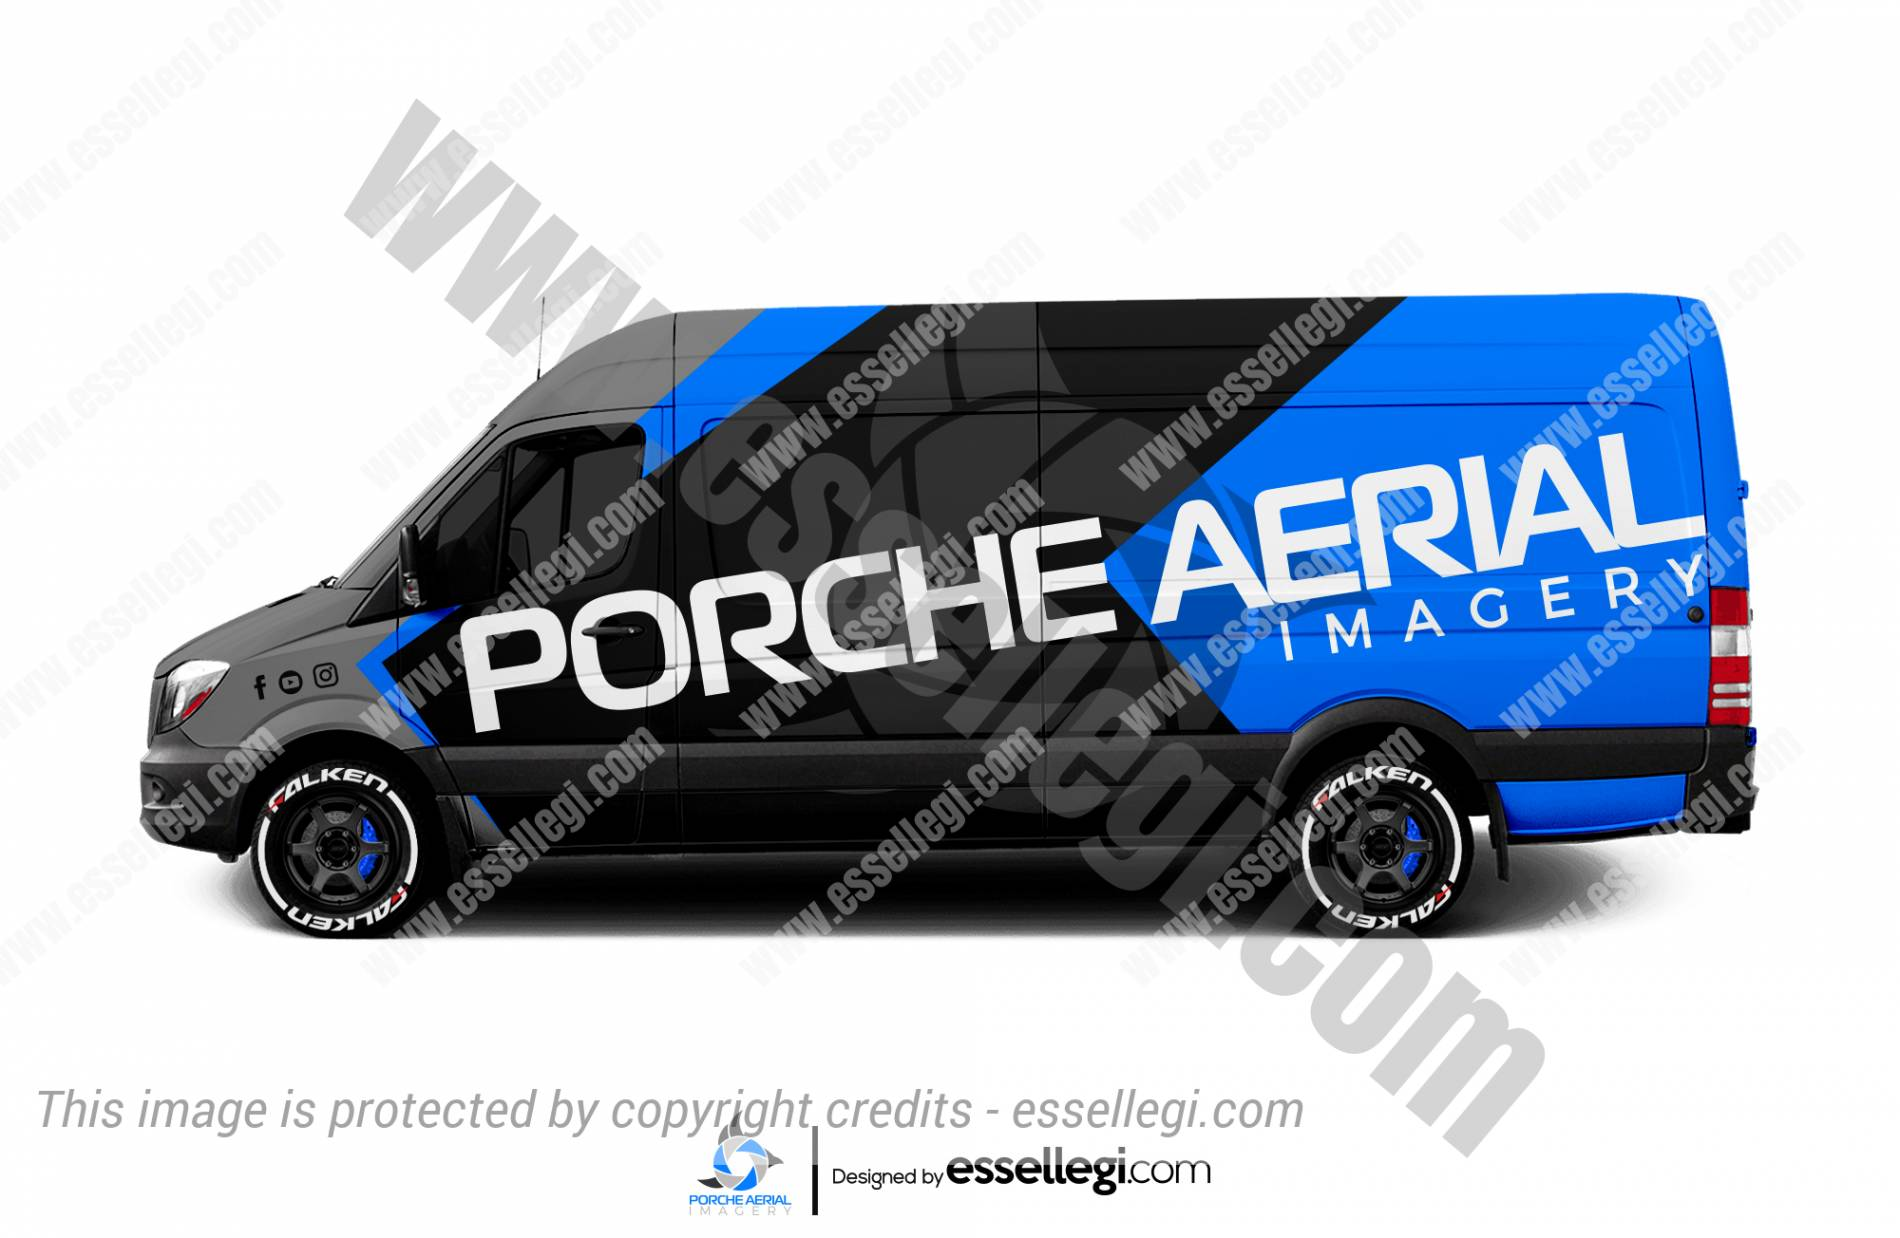 PORCHE AERIAL IMAGERY | VAN WRAP DESIGN 🇺🇸